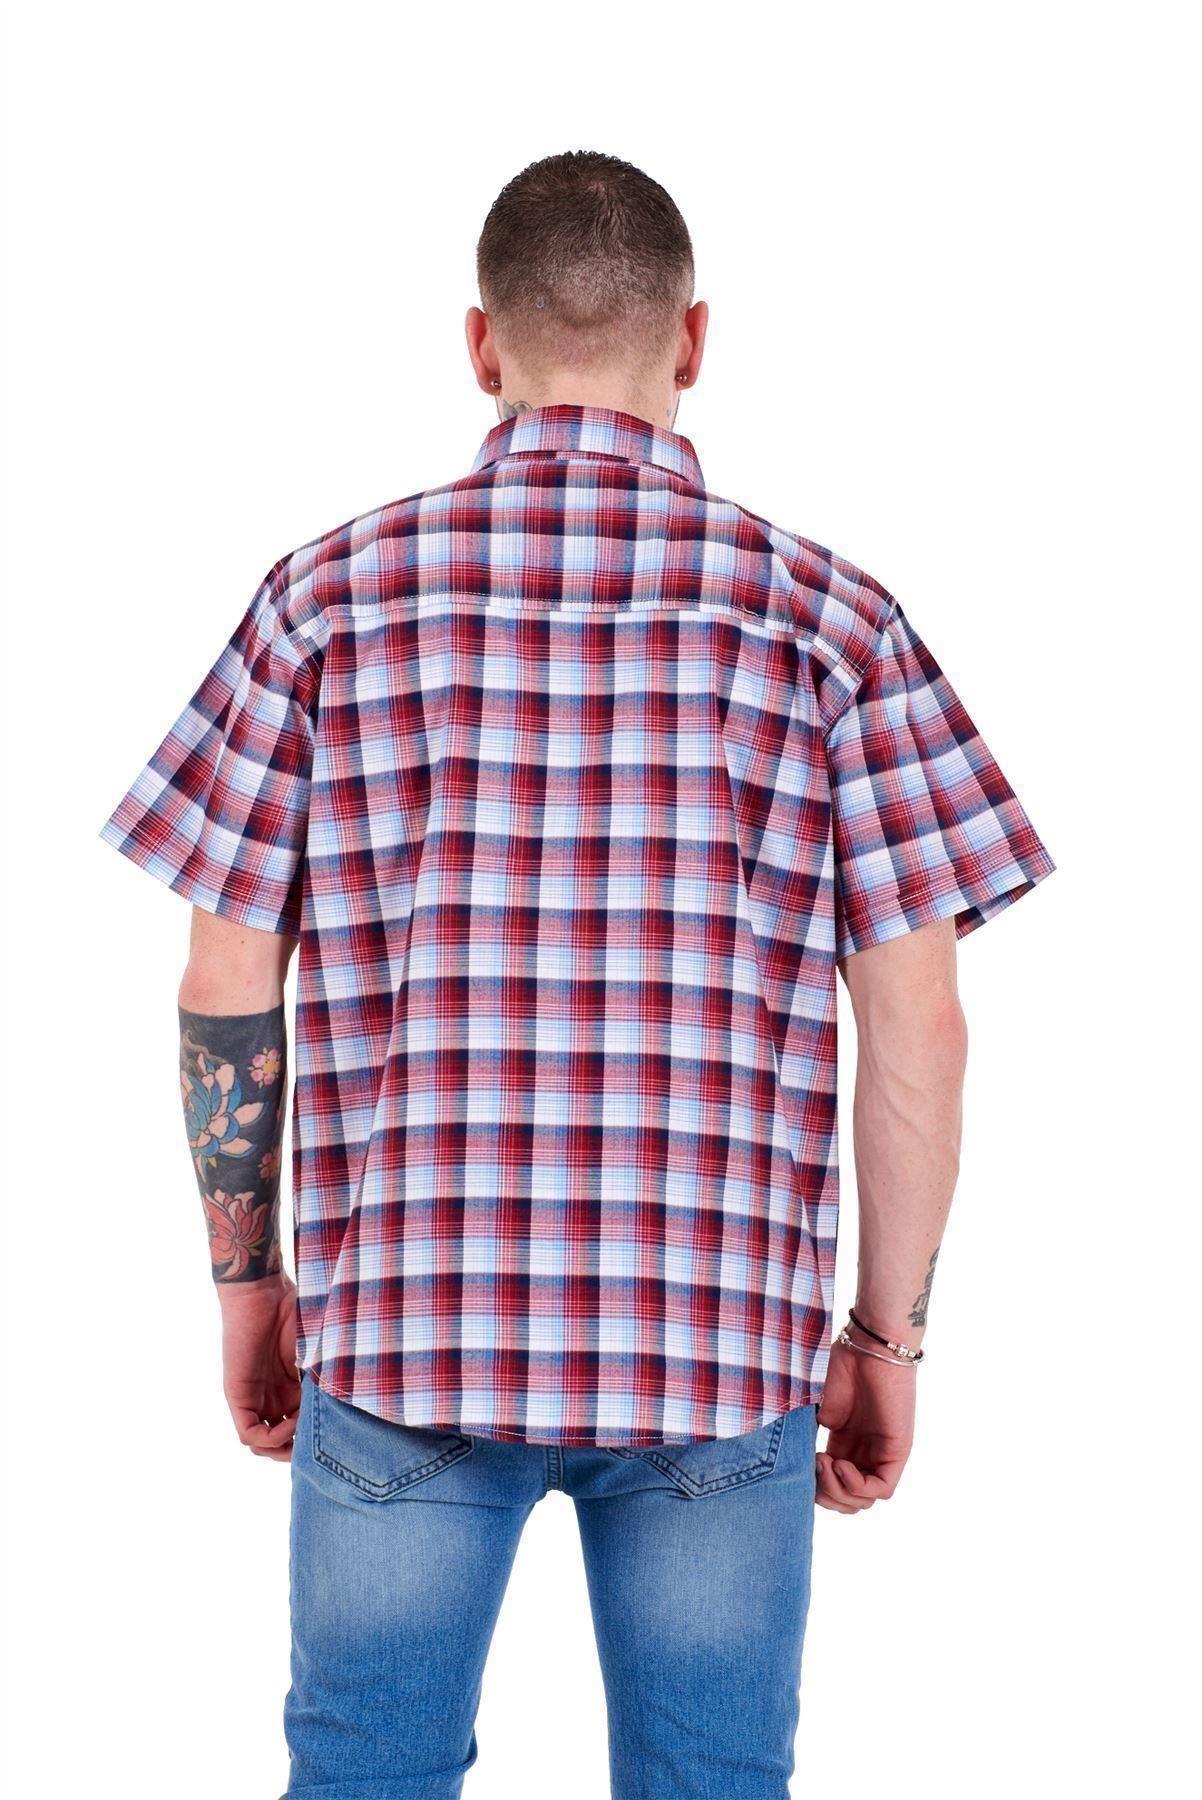 Mens-Regular-Big-Size-Shirts-Checked-Cotton-Blend-Casual-Short-Sleeve-M-to-5XL thumbnail 27